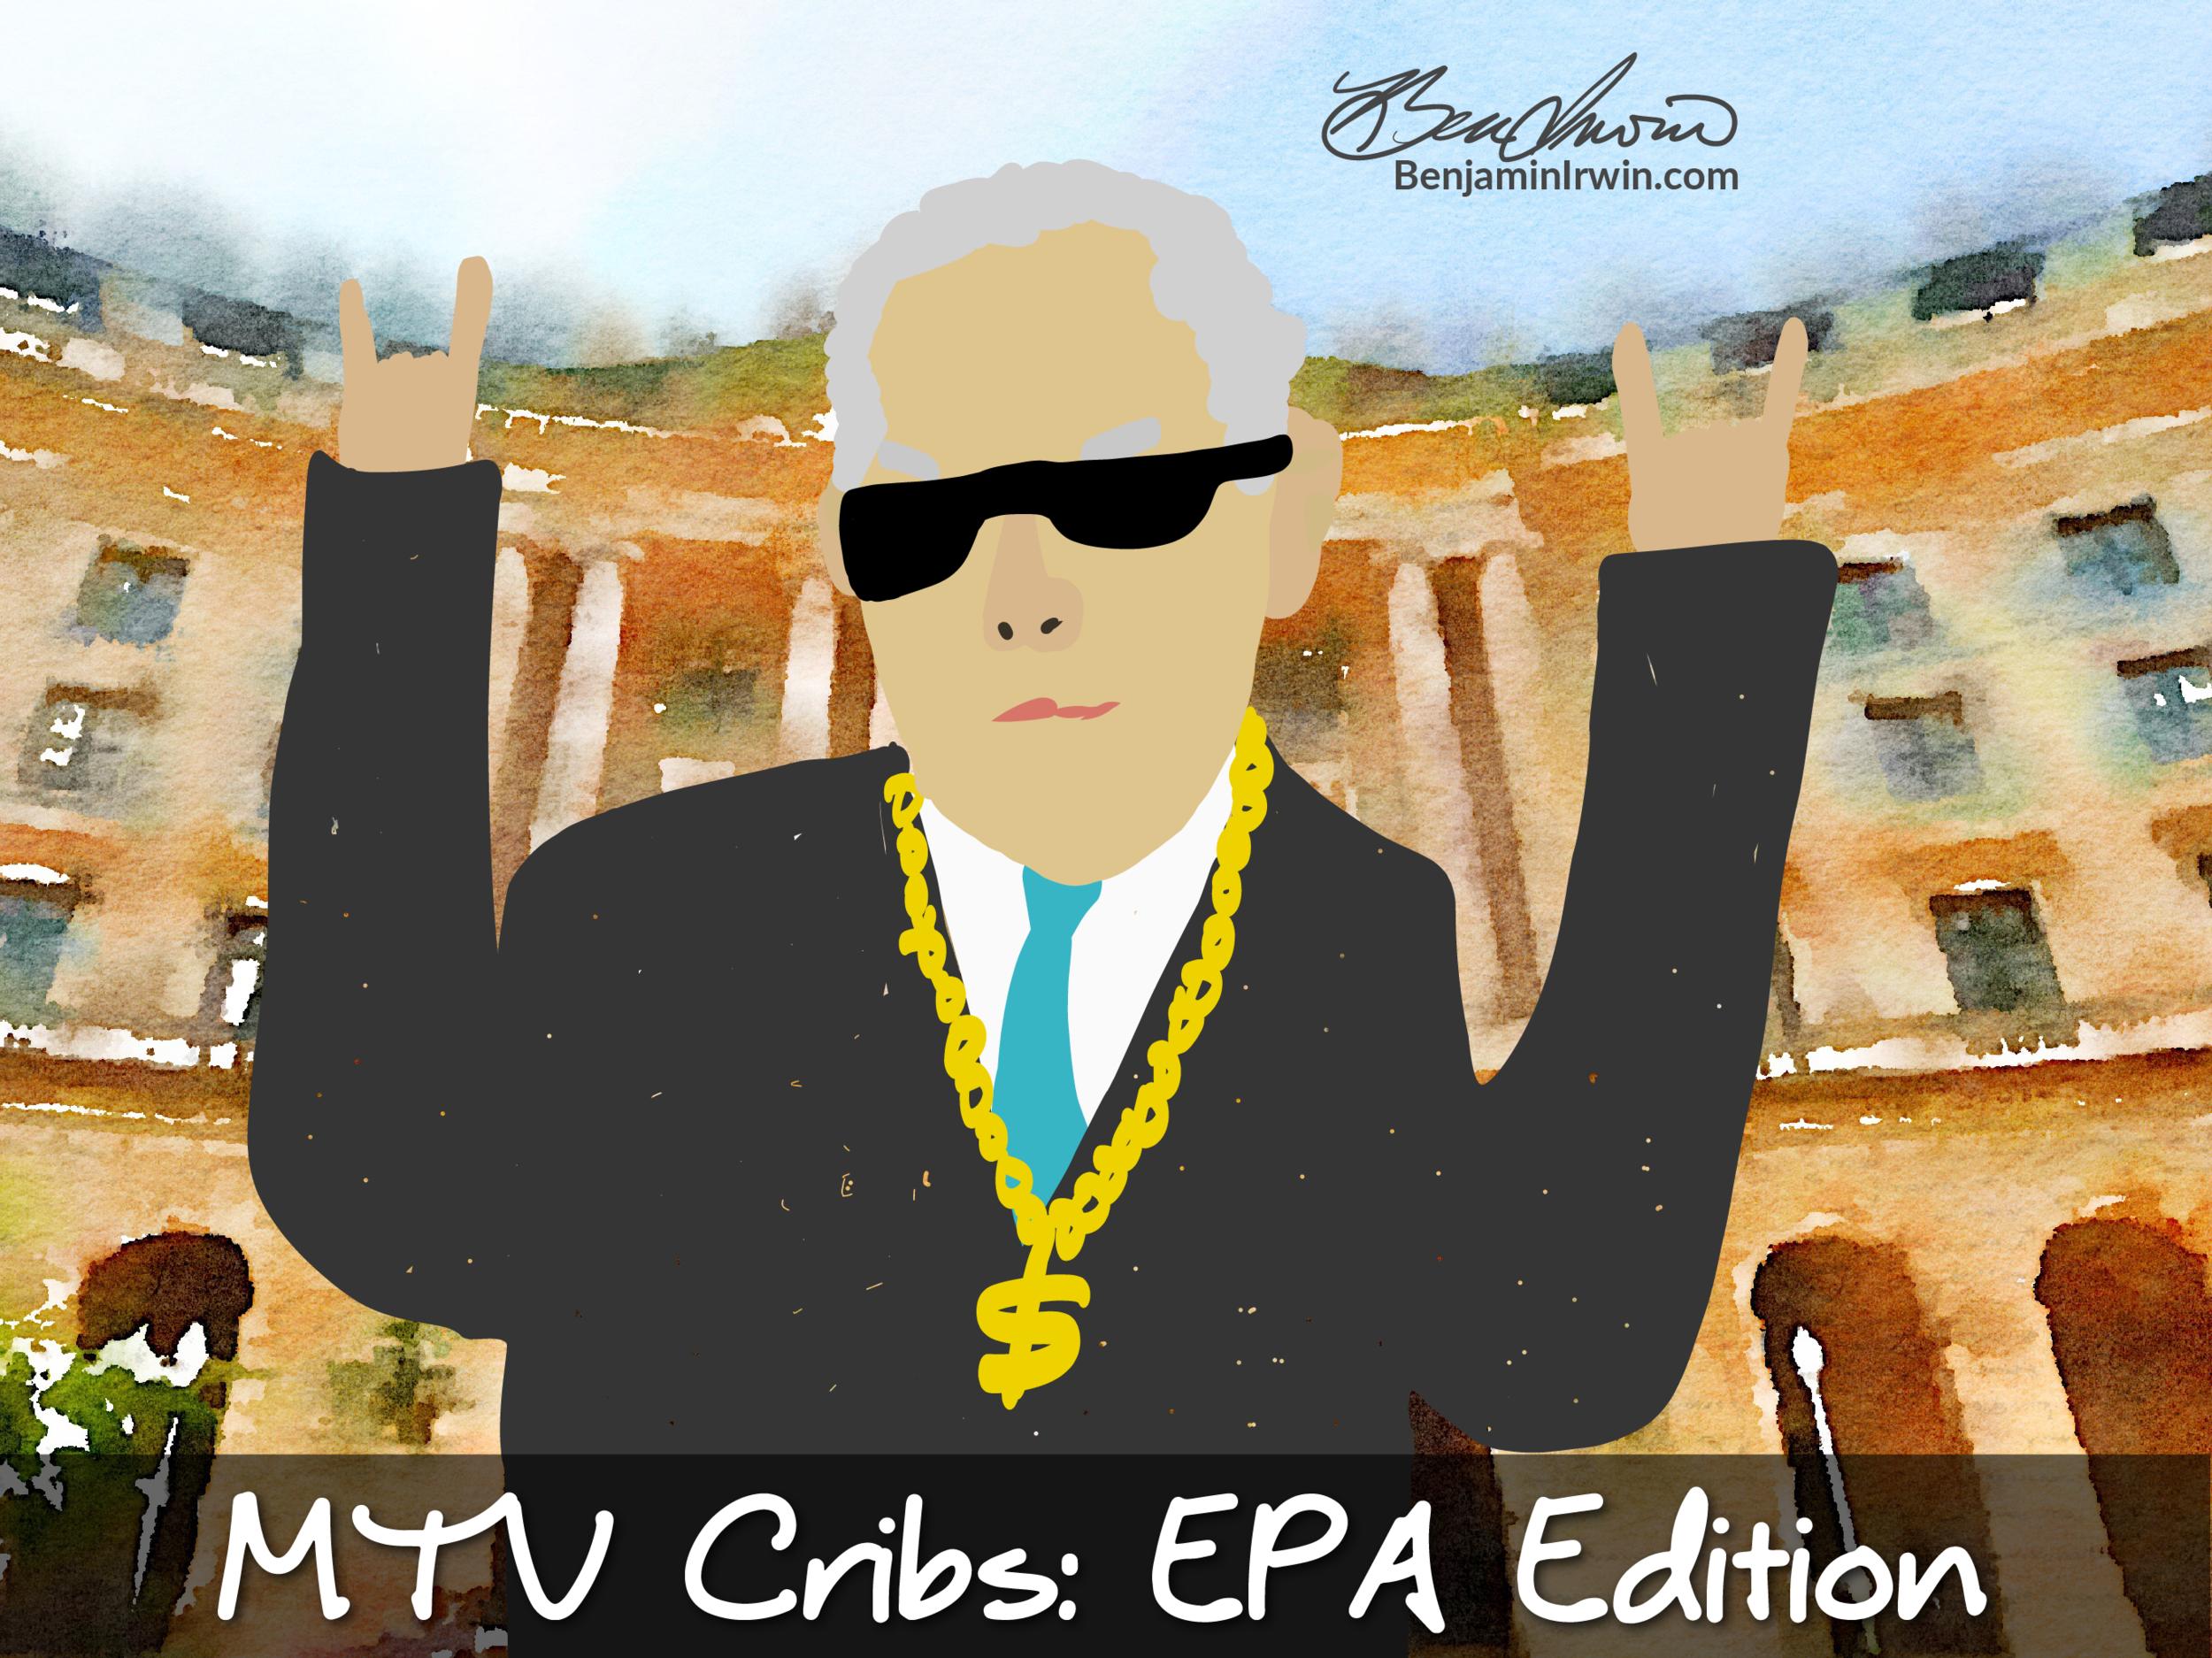 2018.07.06_Cribs EPA Edition-01.png